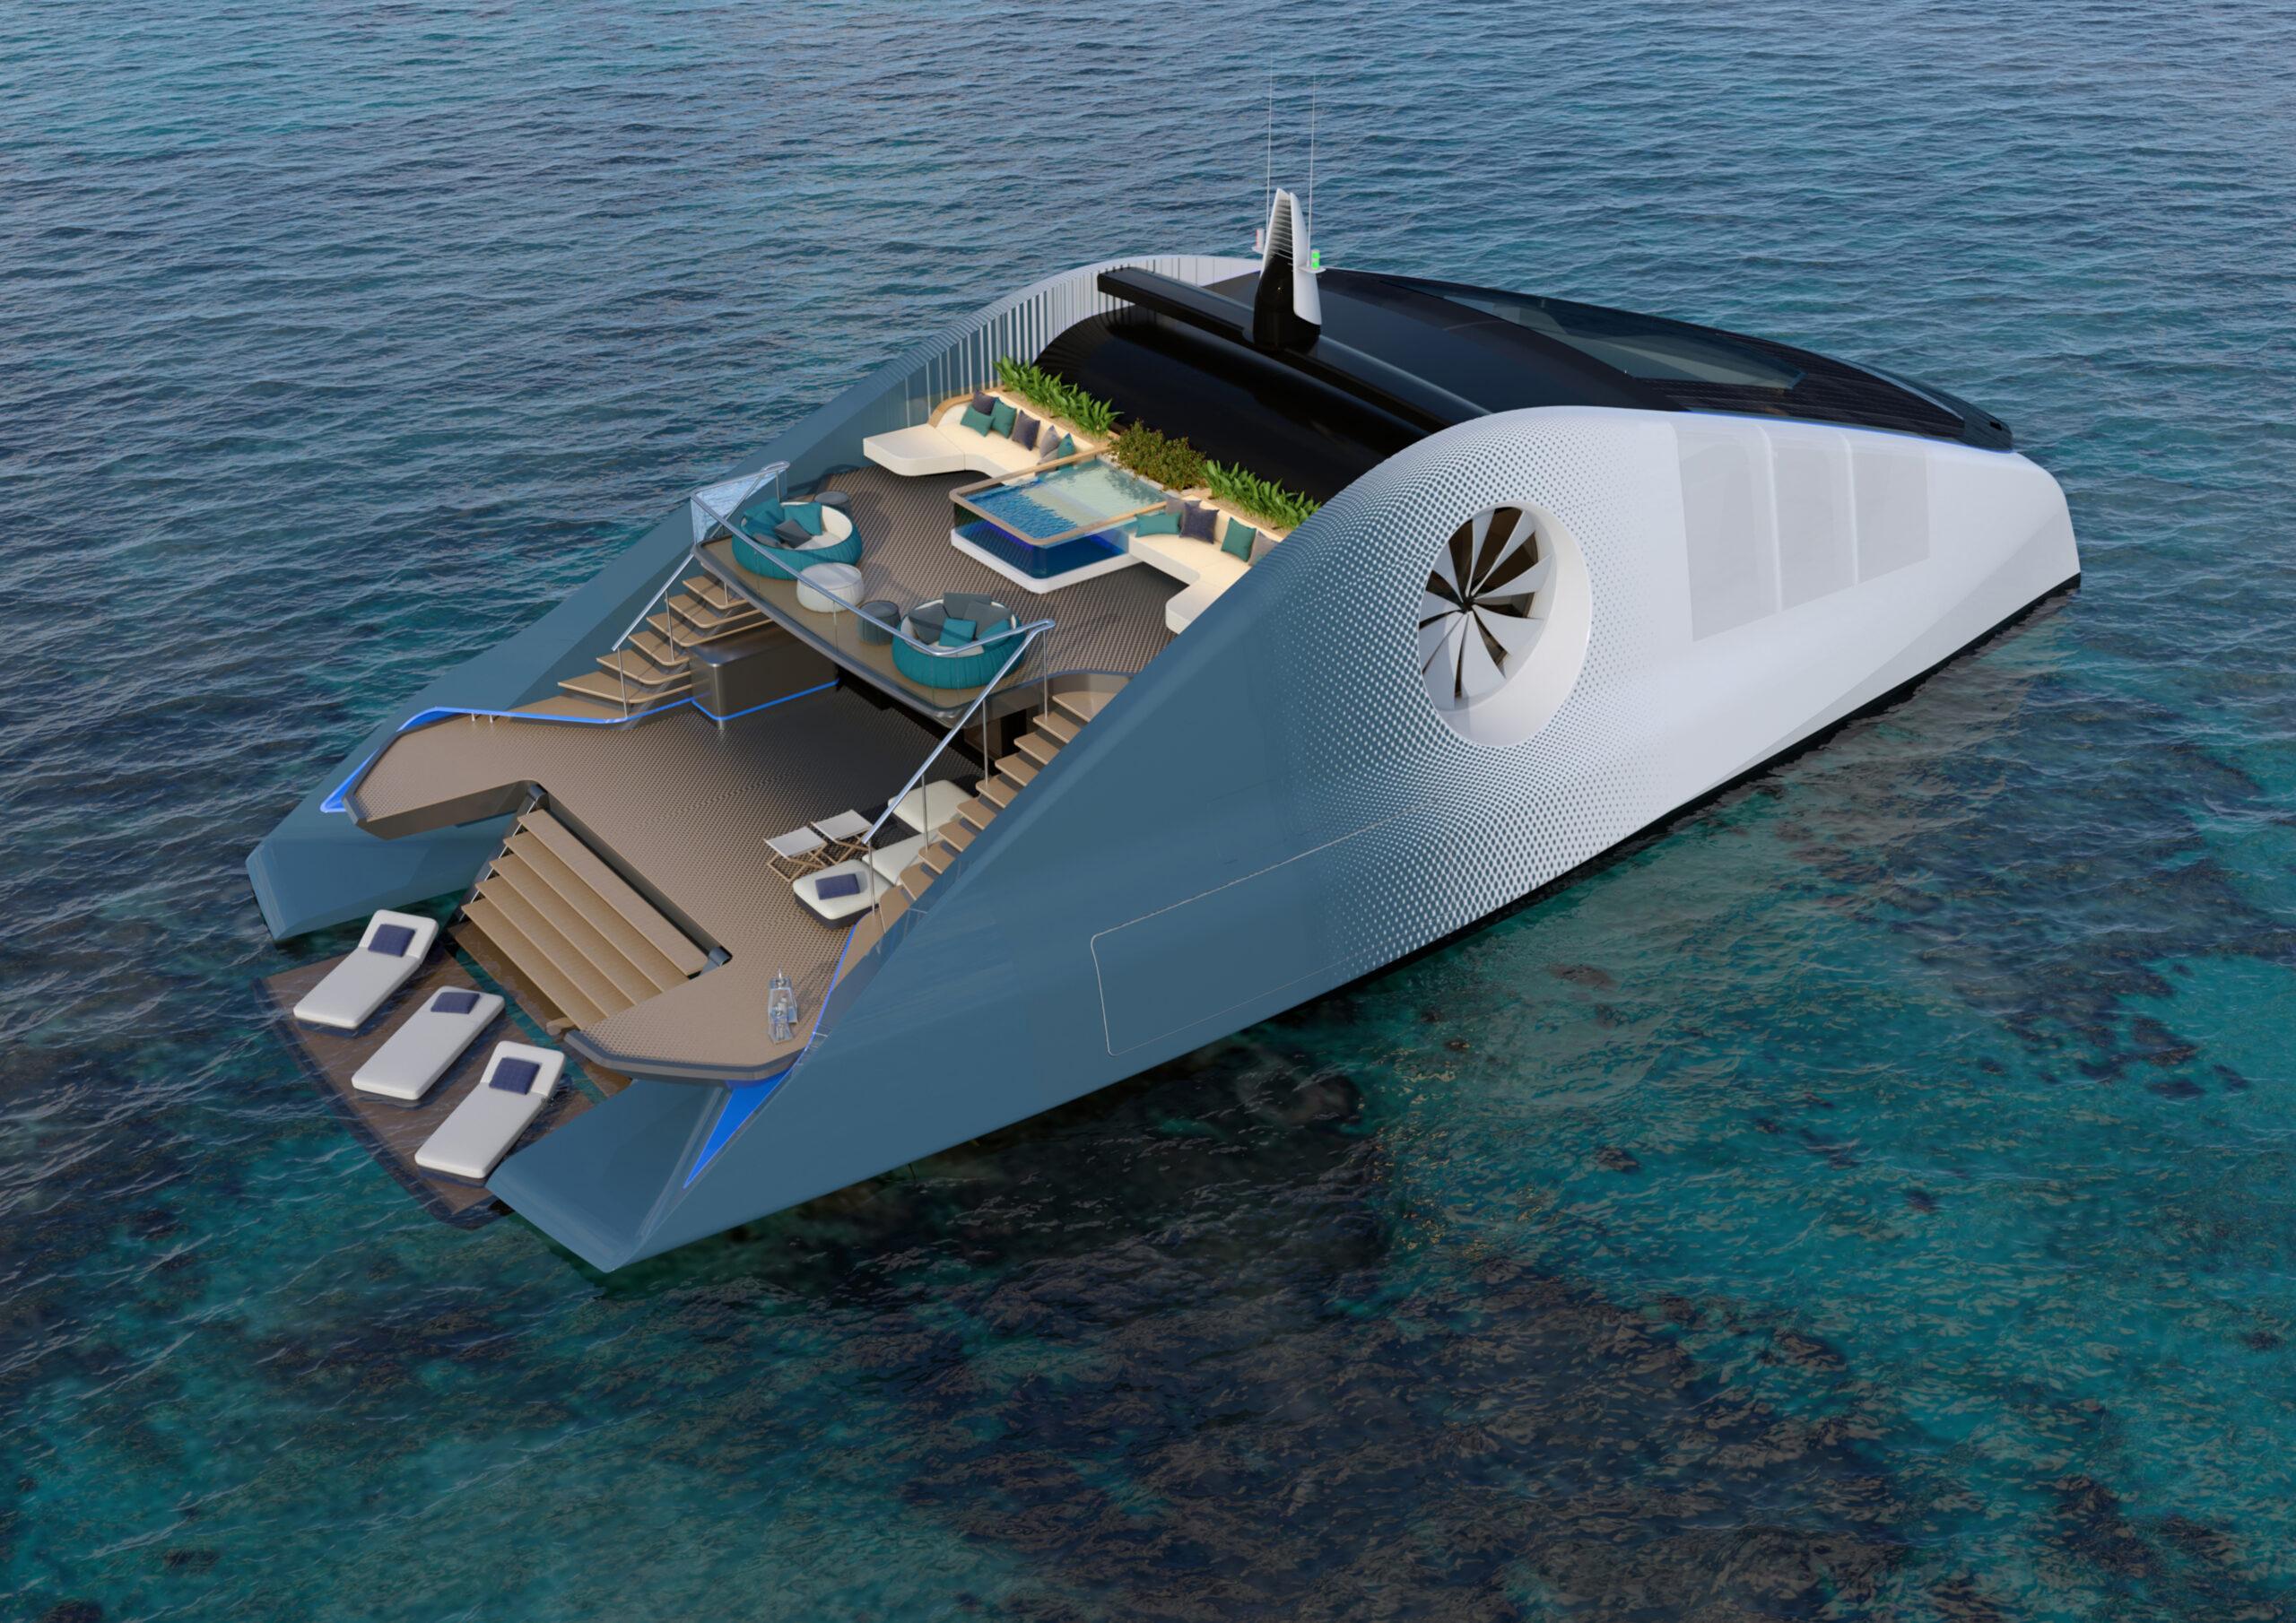 render of Cetacean from Luca Dini Design